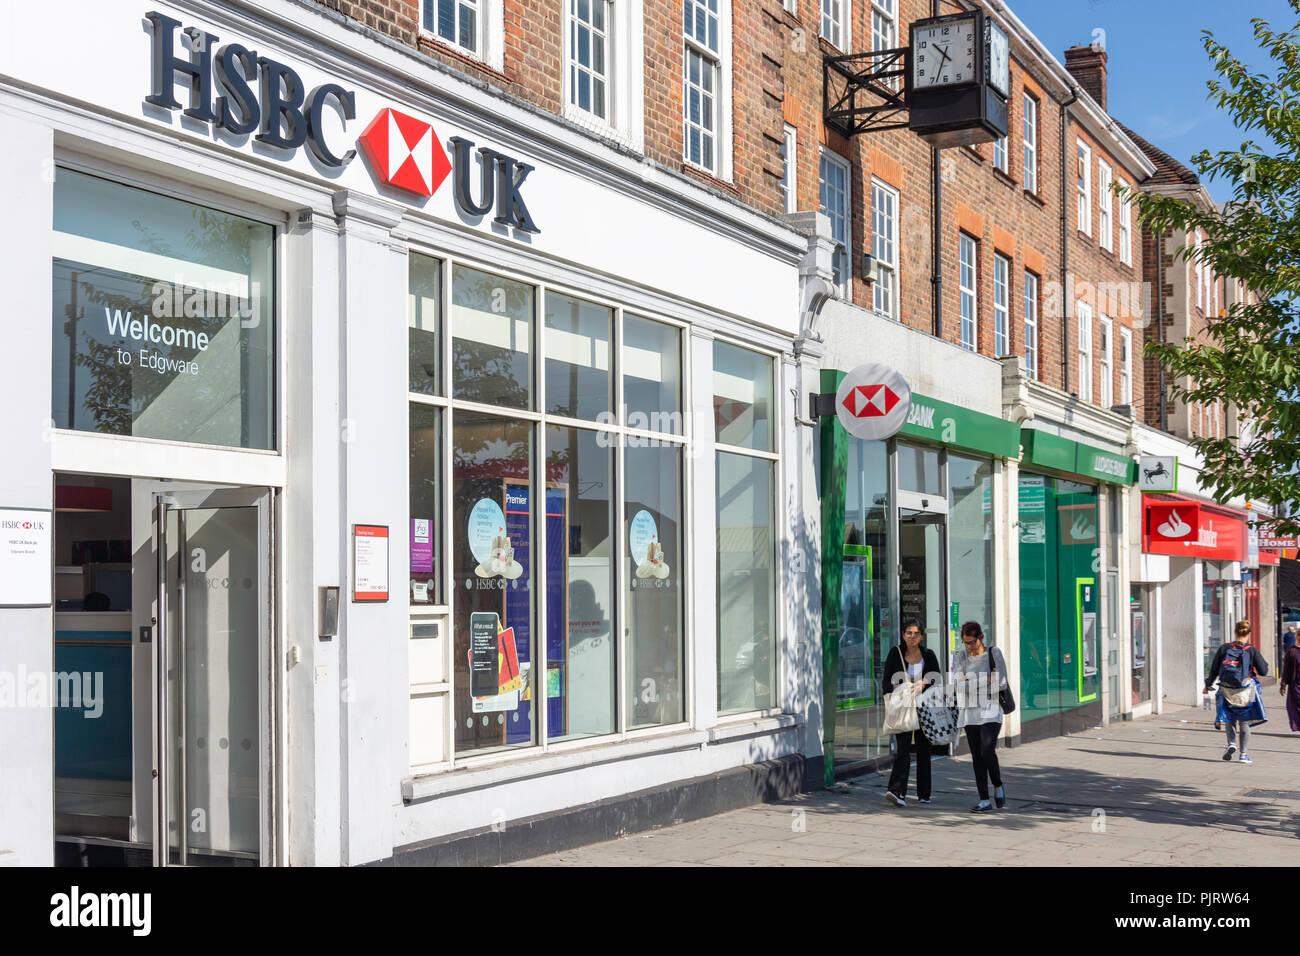 Row of retail banks, Station Road, Edgware, London Borough of Barnet, Greater London, England, United Kingdom - Stock Image